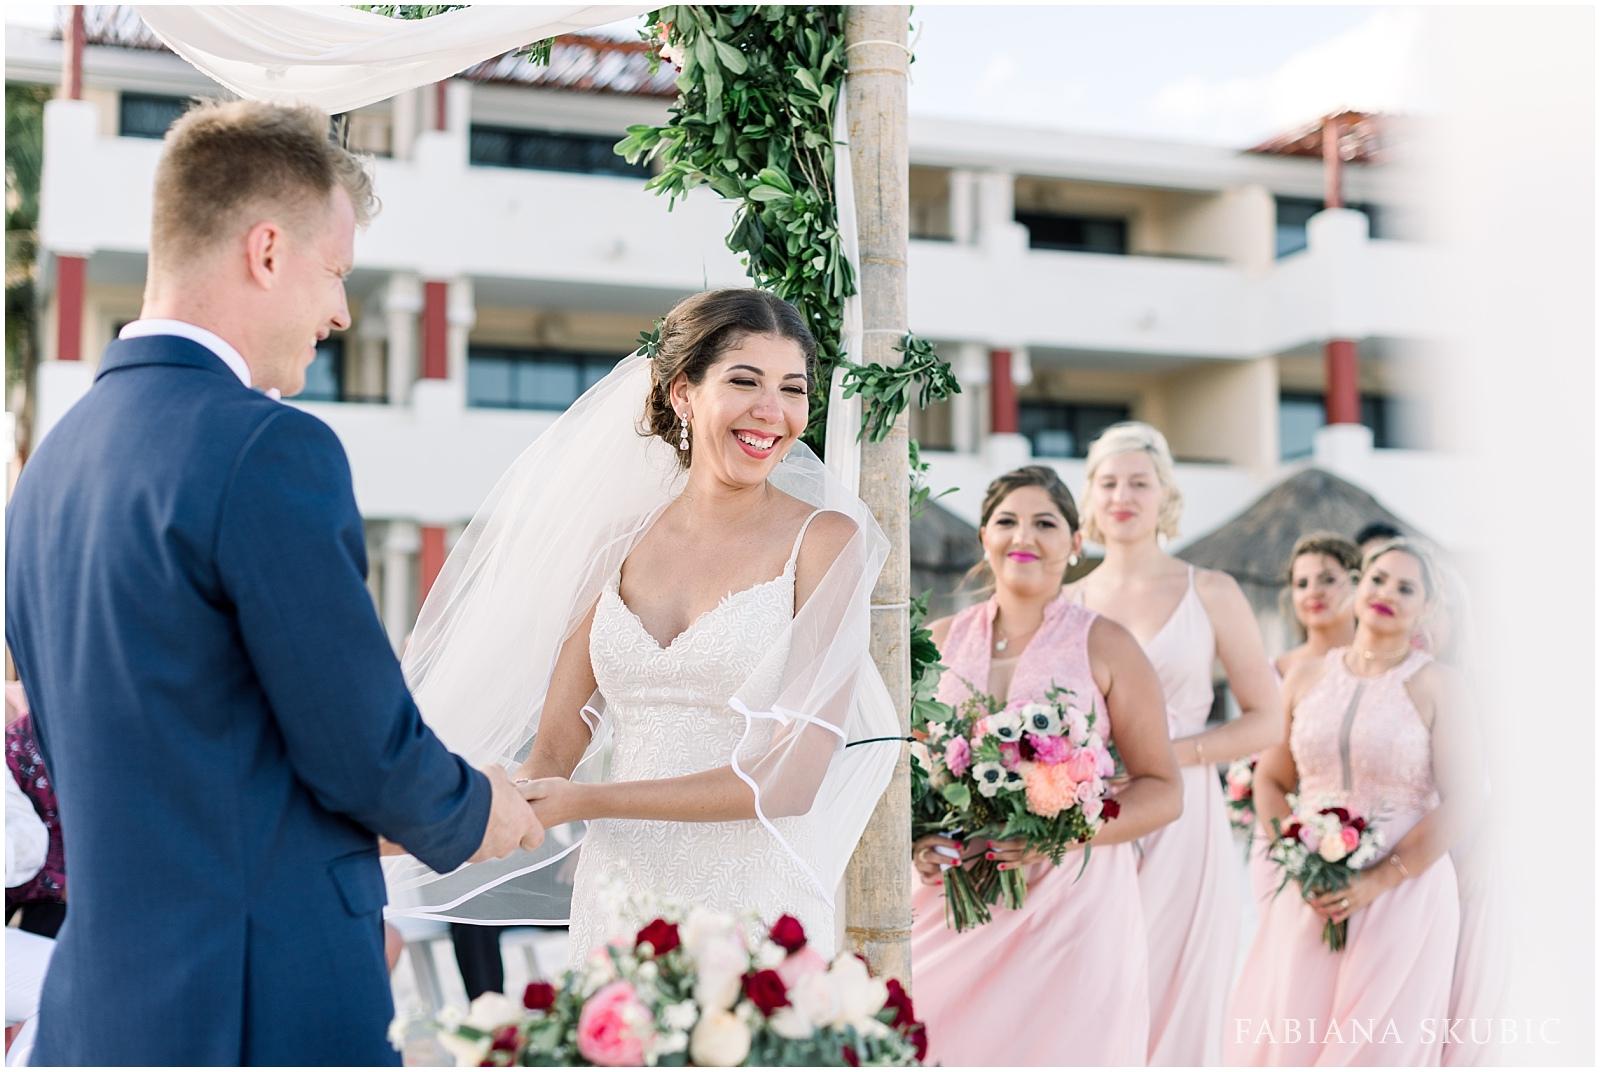 TJ_Now_Sapphire_Riviera_Cancun_Mexico_Wedding_Photos_0235.jpg